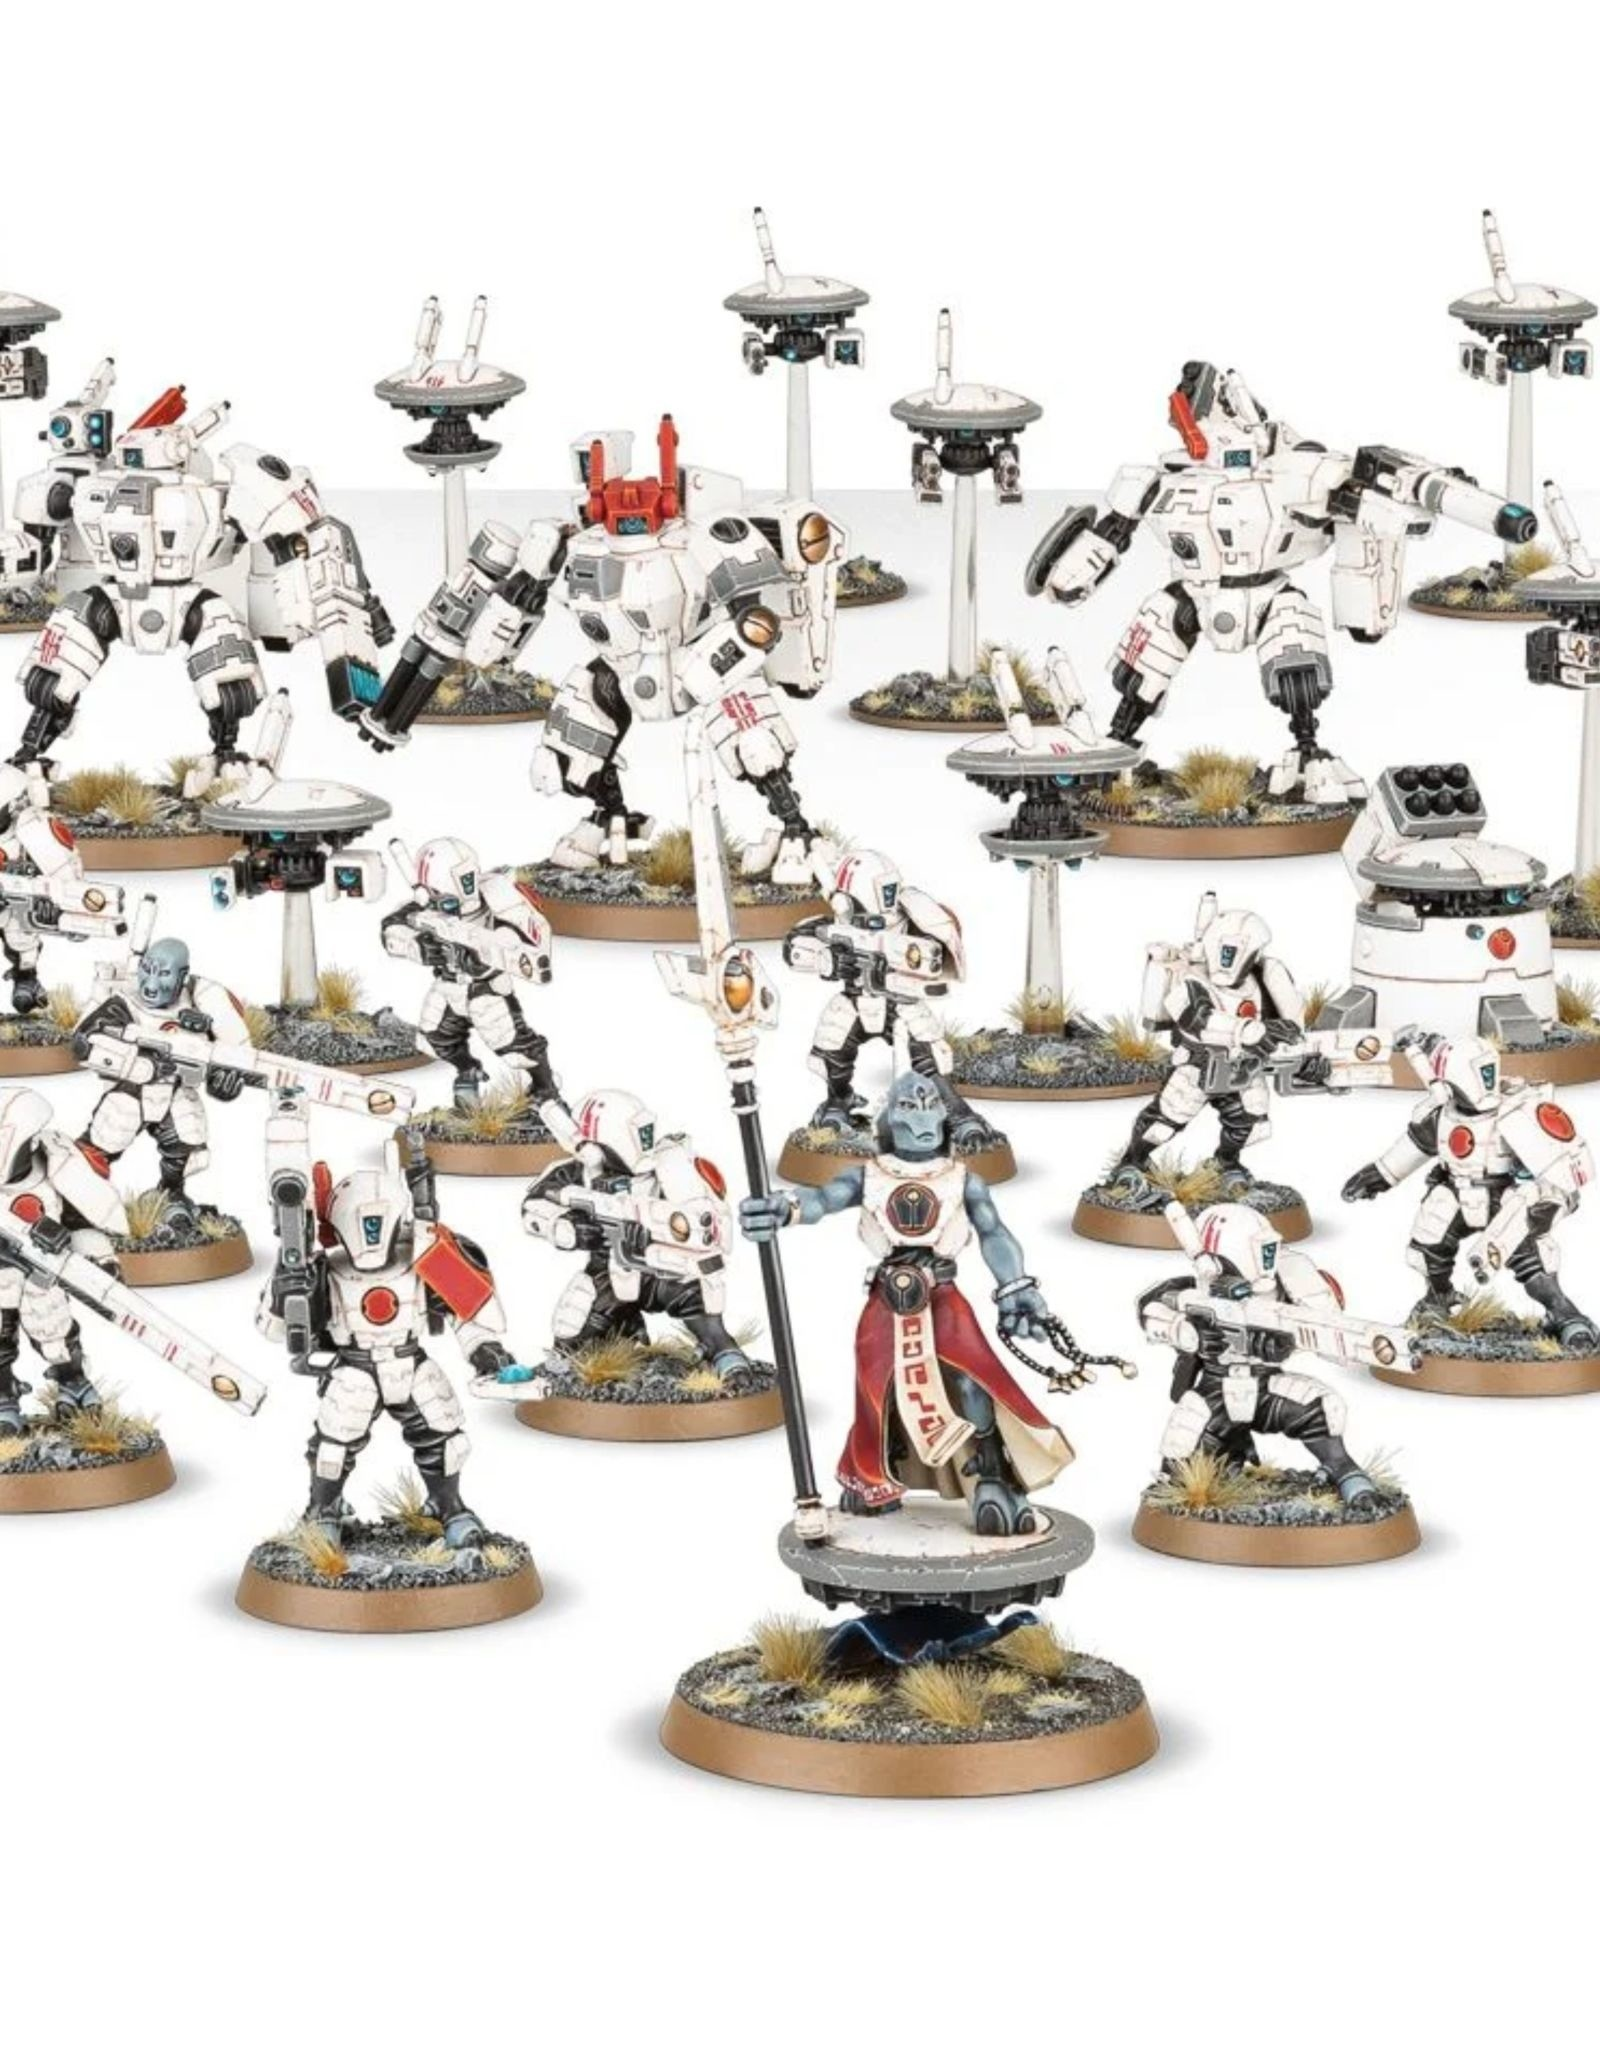 Warhammer 40k Start Collecting: Tau Empire